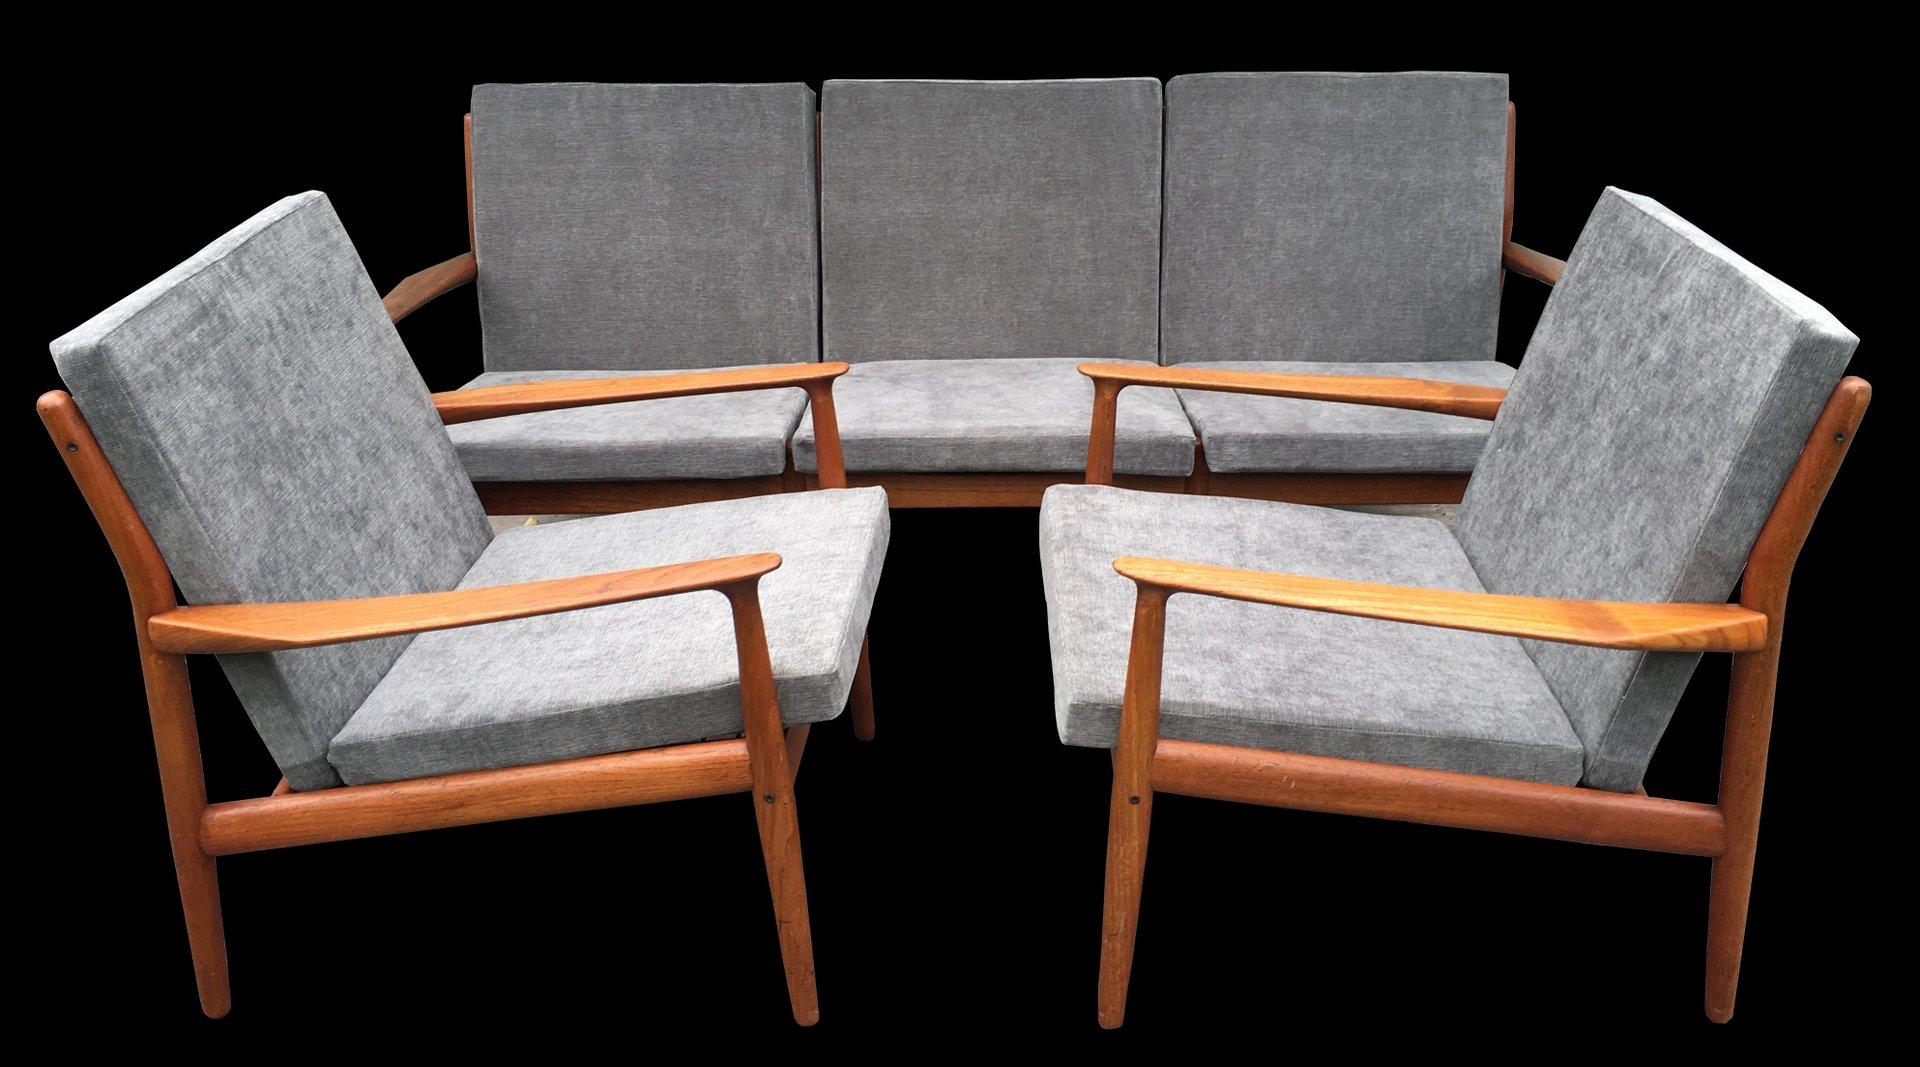 canap fauteuils en teck par greta jalk 1960s en vente. Black Bedroom Furniture Sets. Home Design Ideas